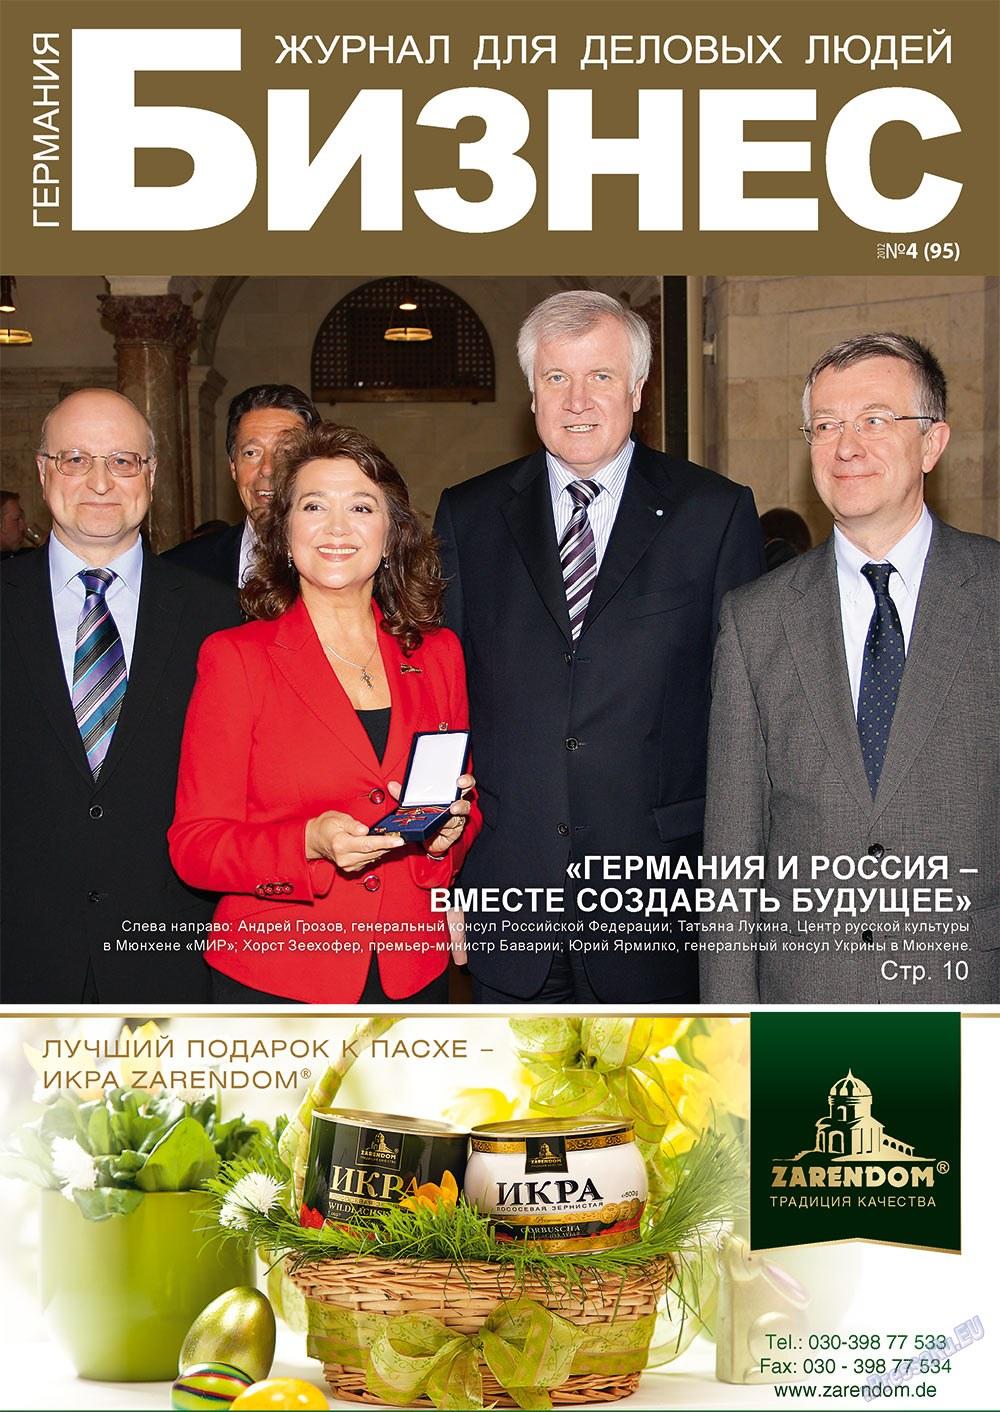 Бизнес (журнал). 2012 год, номер 4, стр. 1